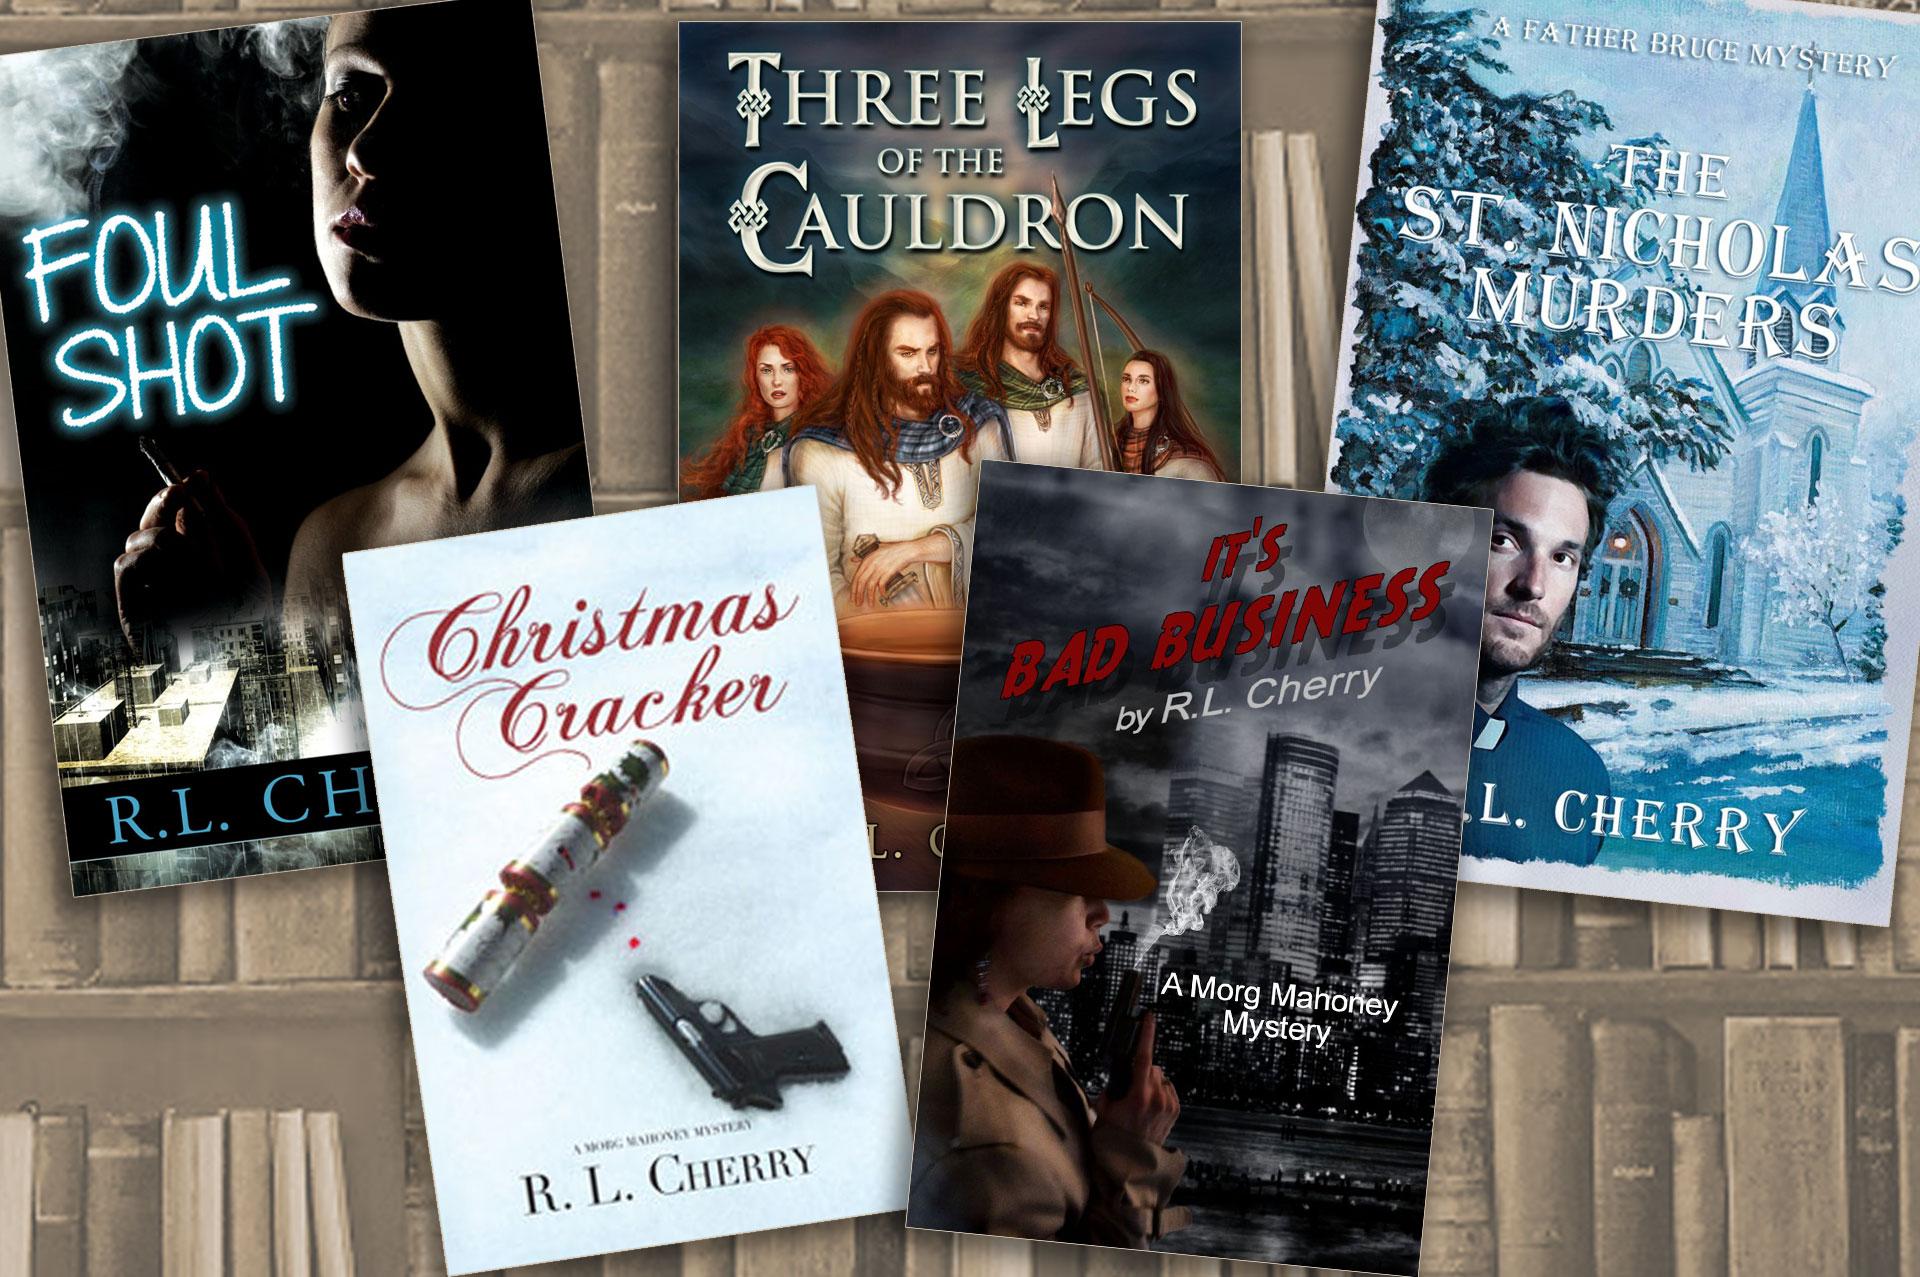 Books by RL Cherry